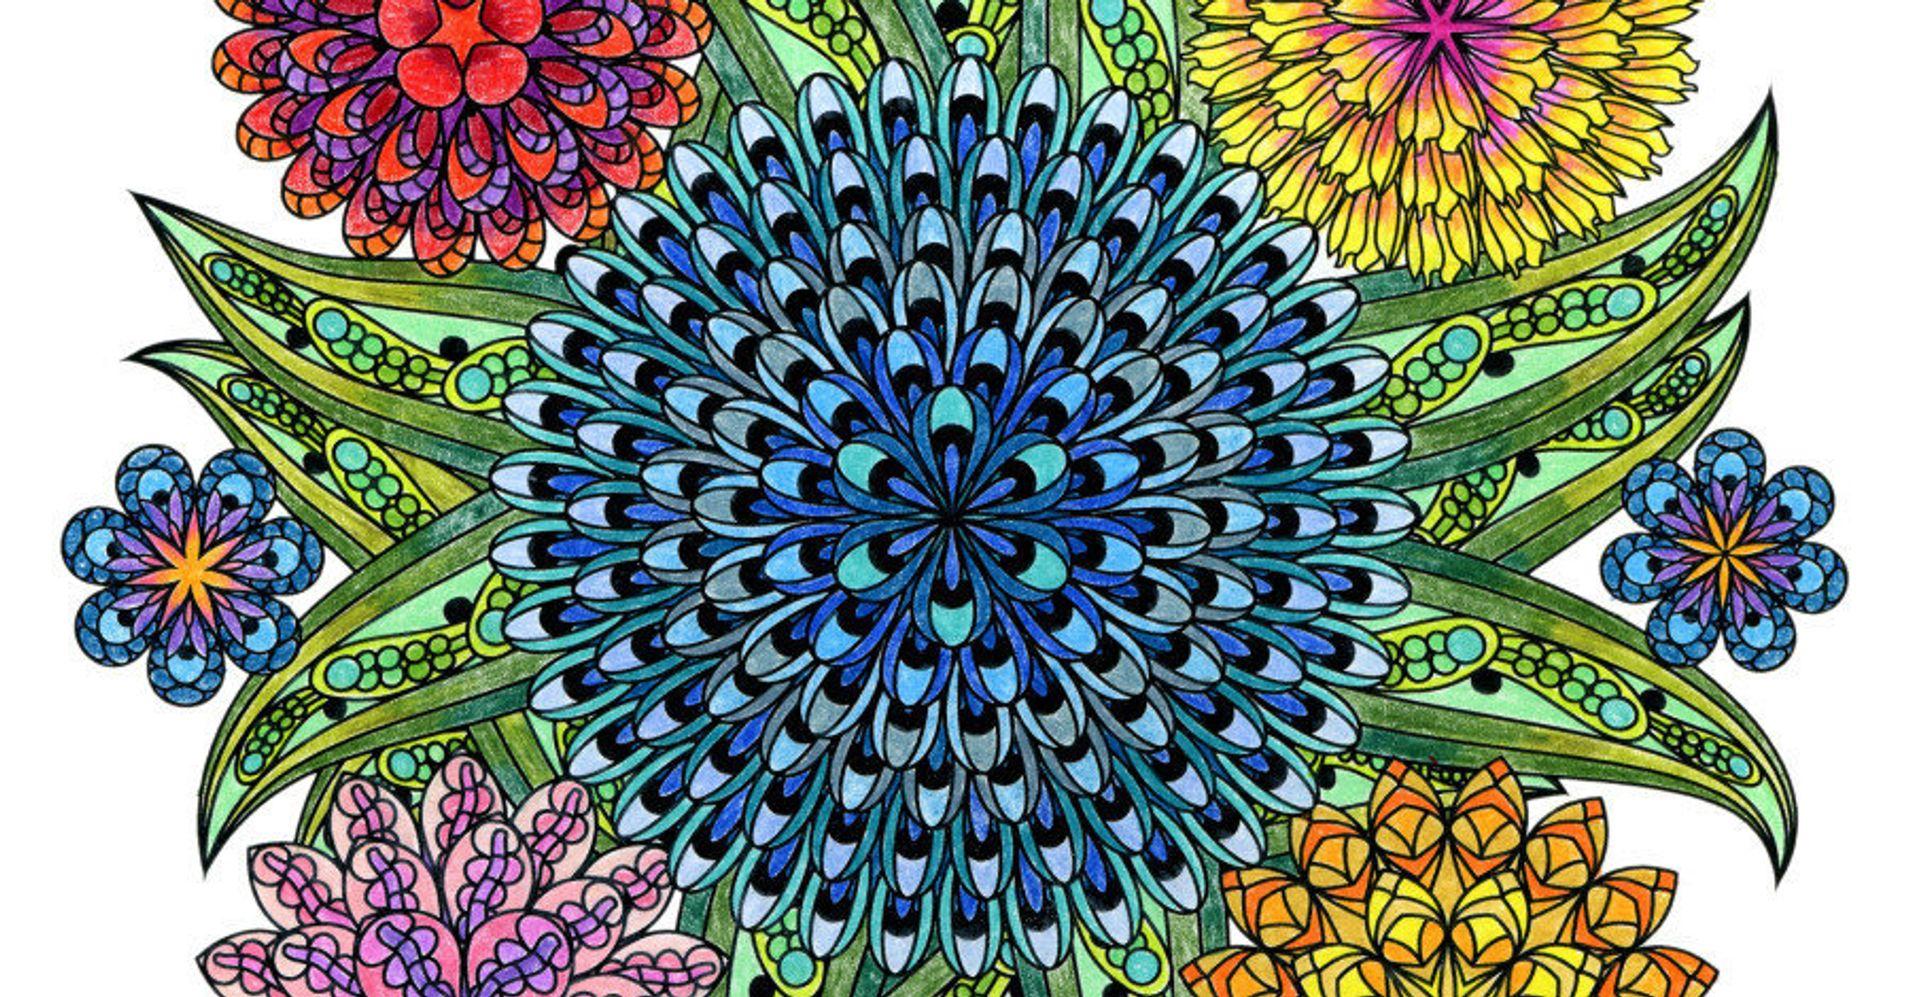 Coloring book adult meditation stress - Coloring Book Adult Meditation Stress 57